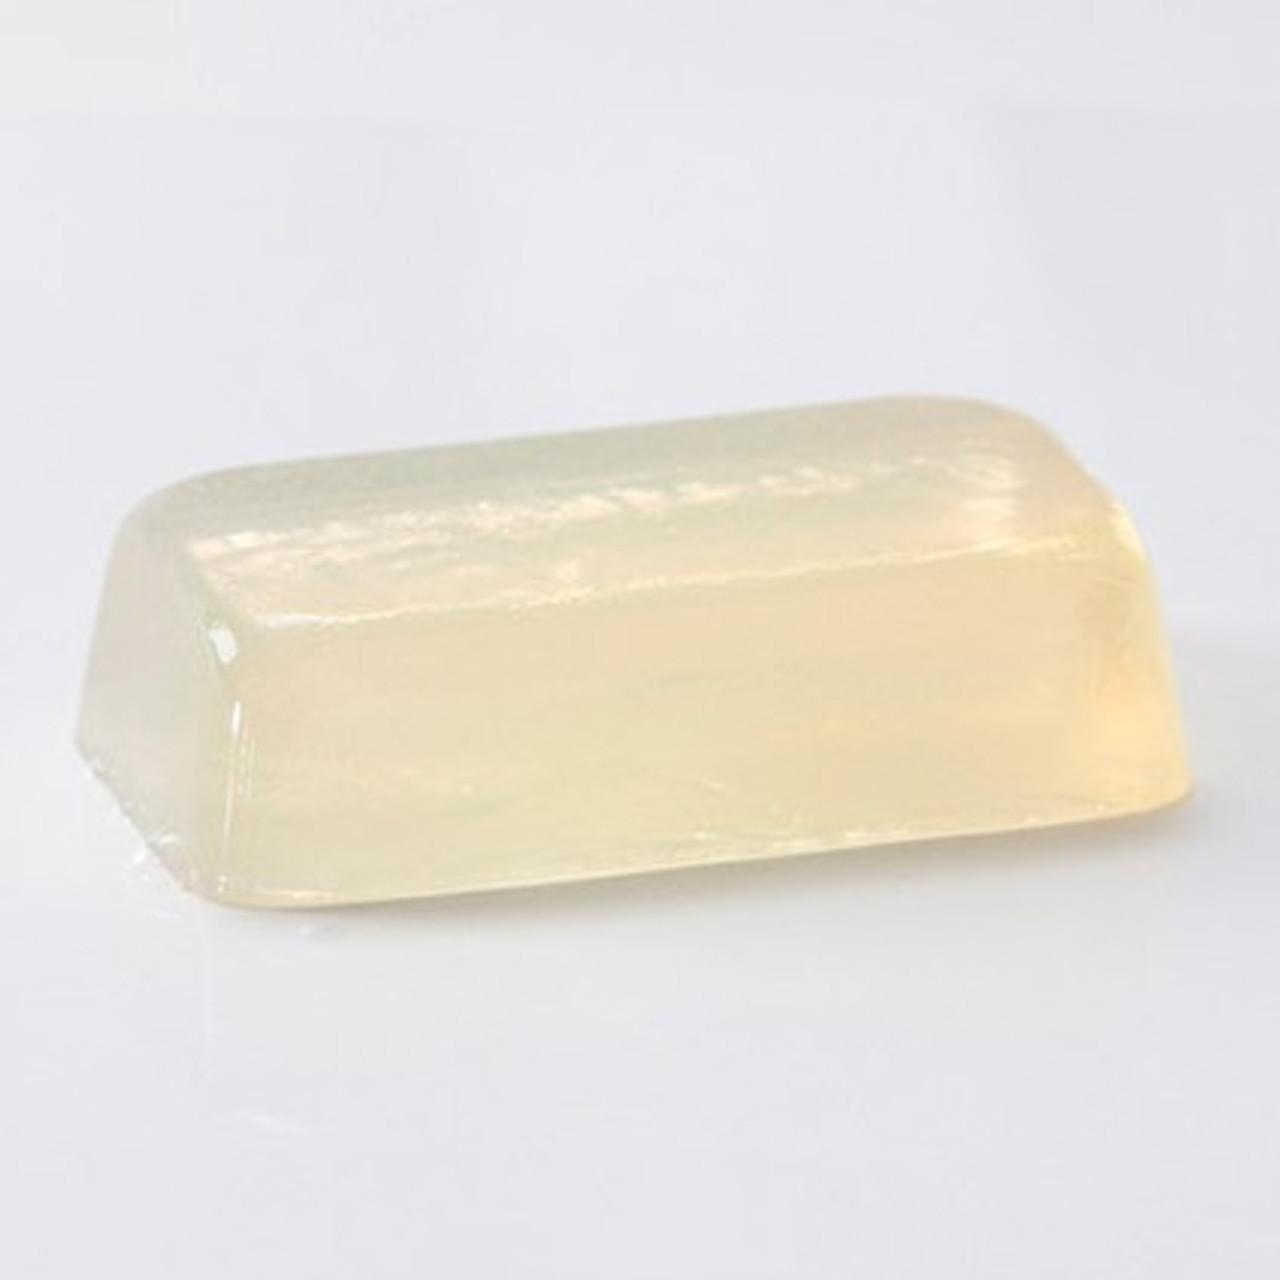 Stephenson Crystal Hemp Melt Pour Soap Base The Flaming Candle Company